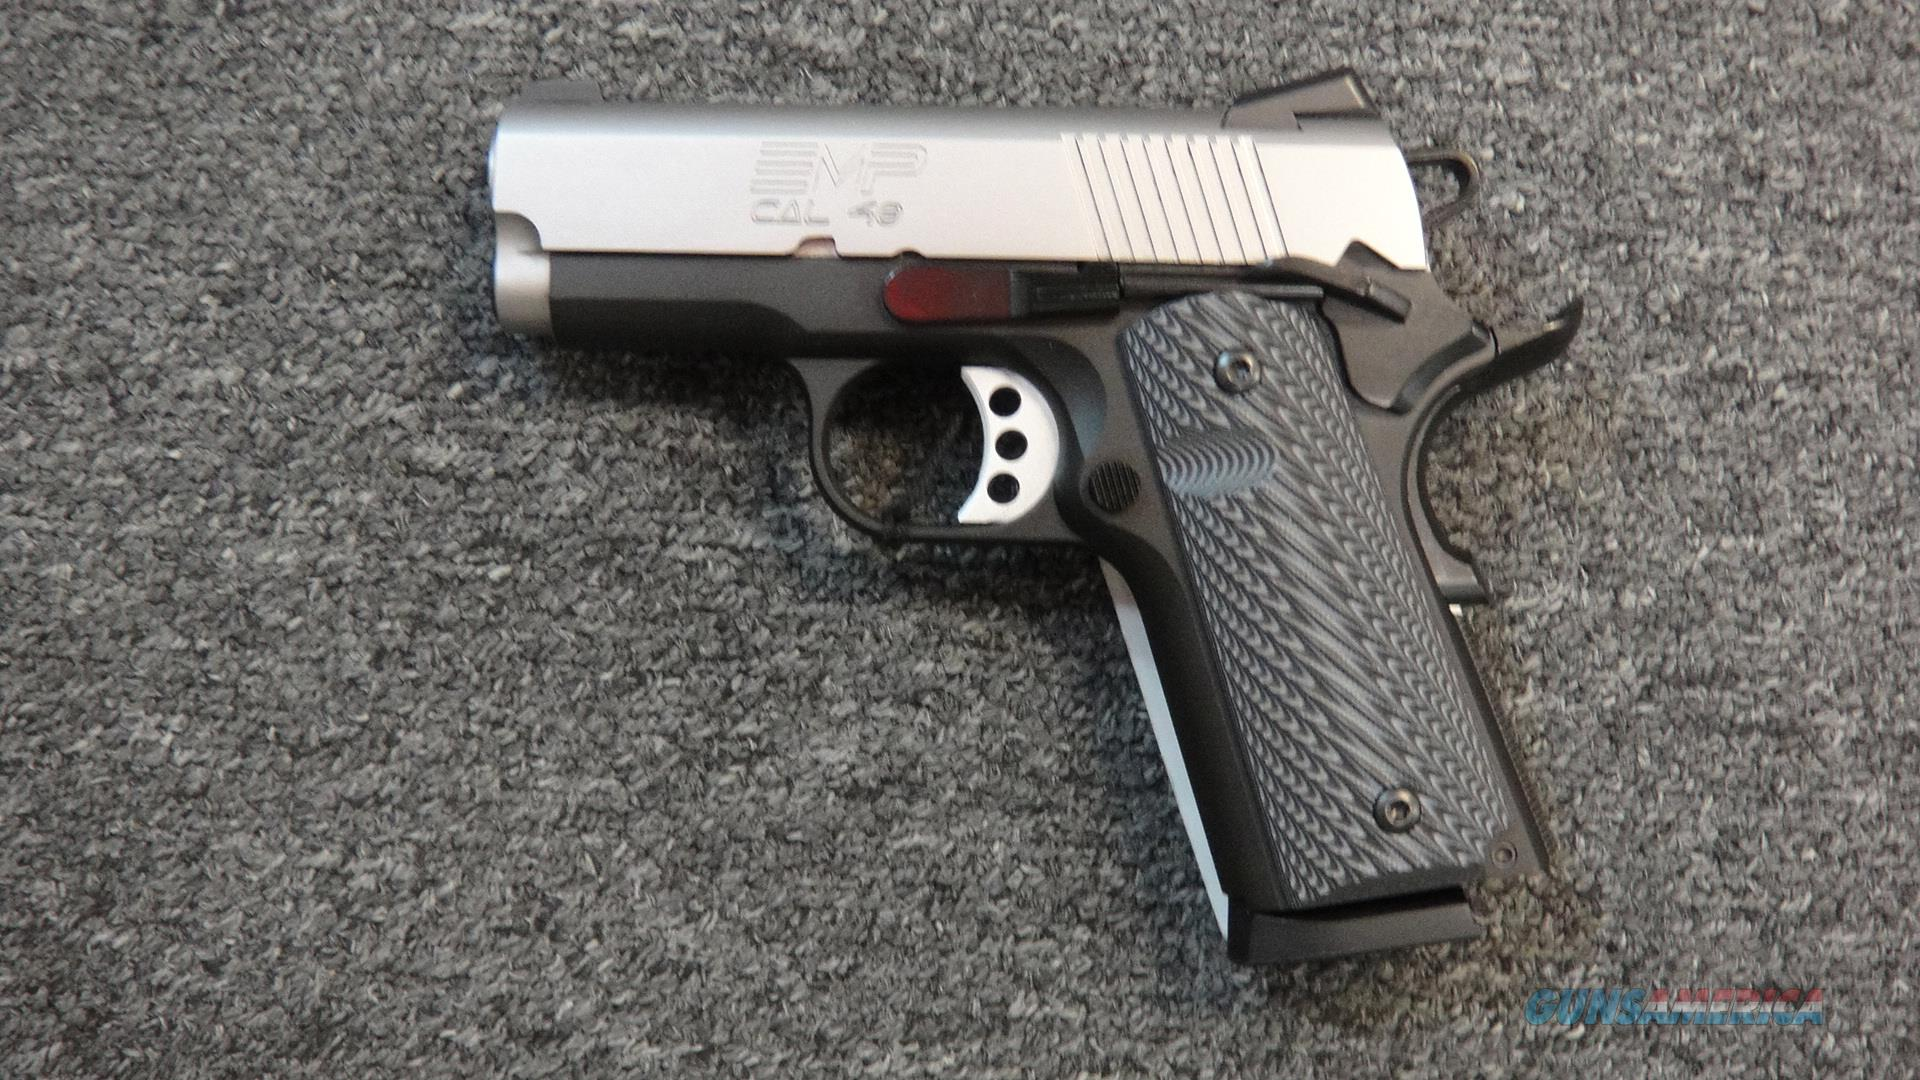 Springfield Armory EMP .40 S&W  Guns > Pistols > Springfield Armory Pistols > 1911 Type